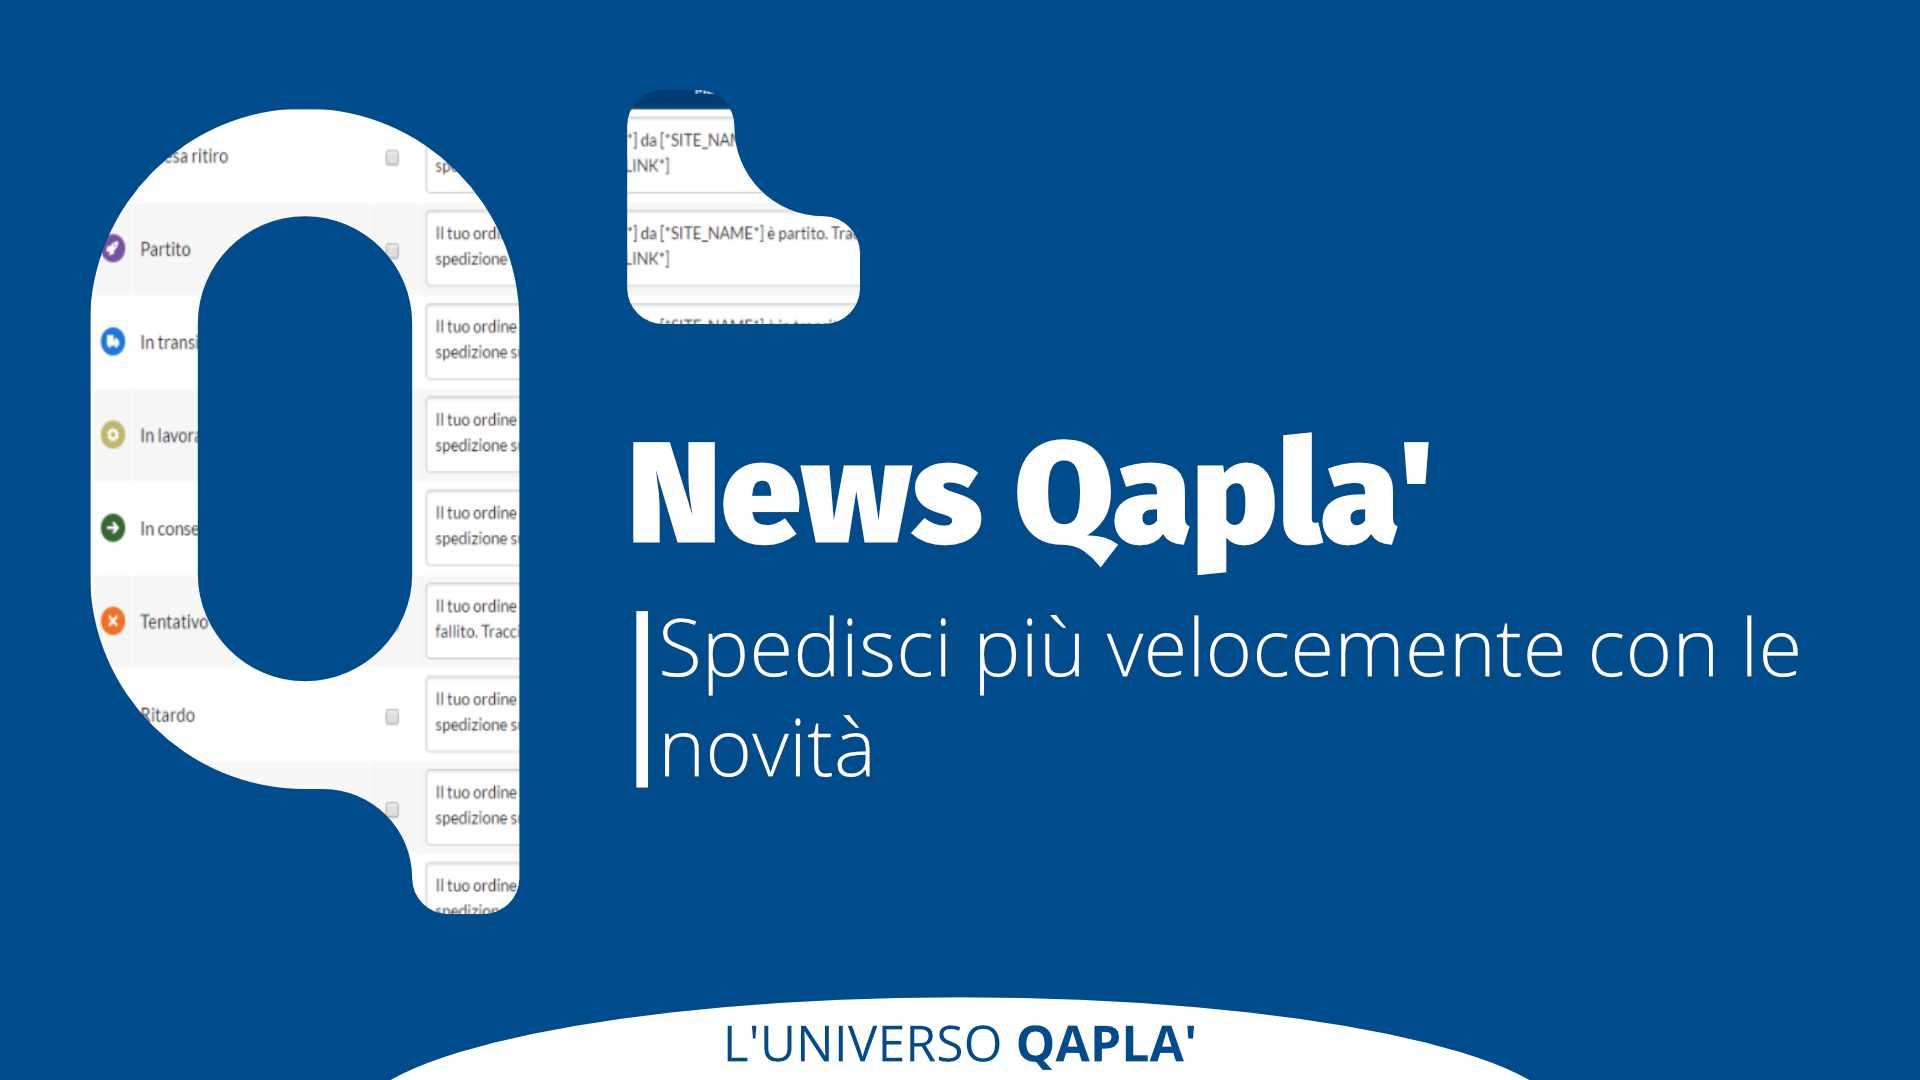 news qapla marzo 2017